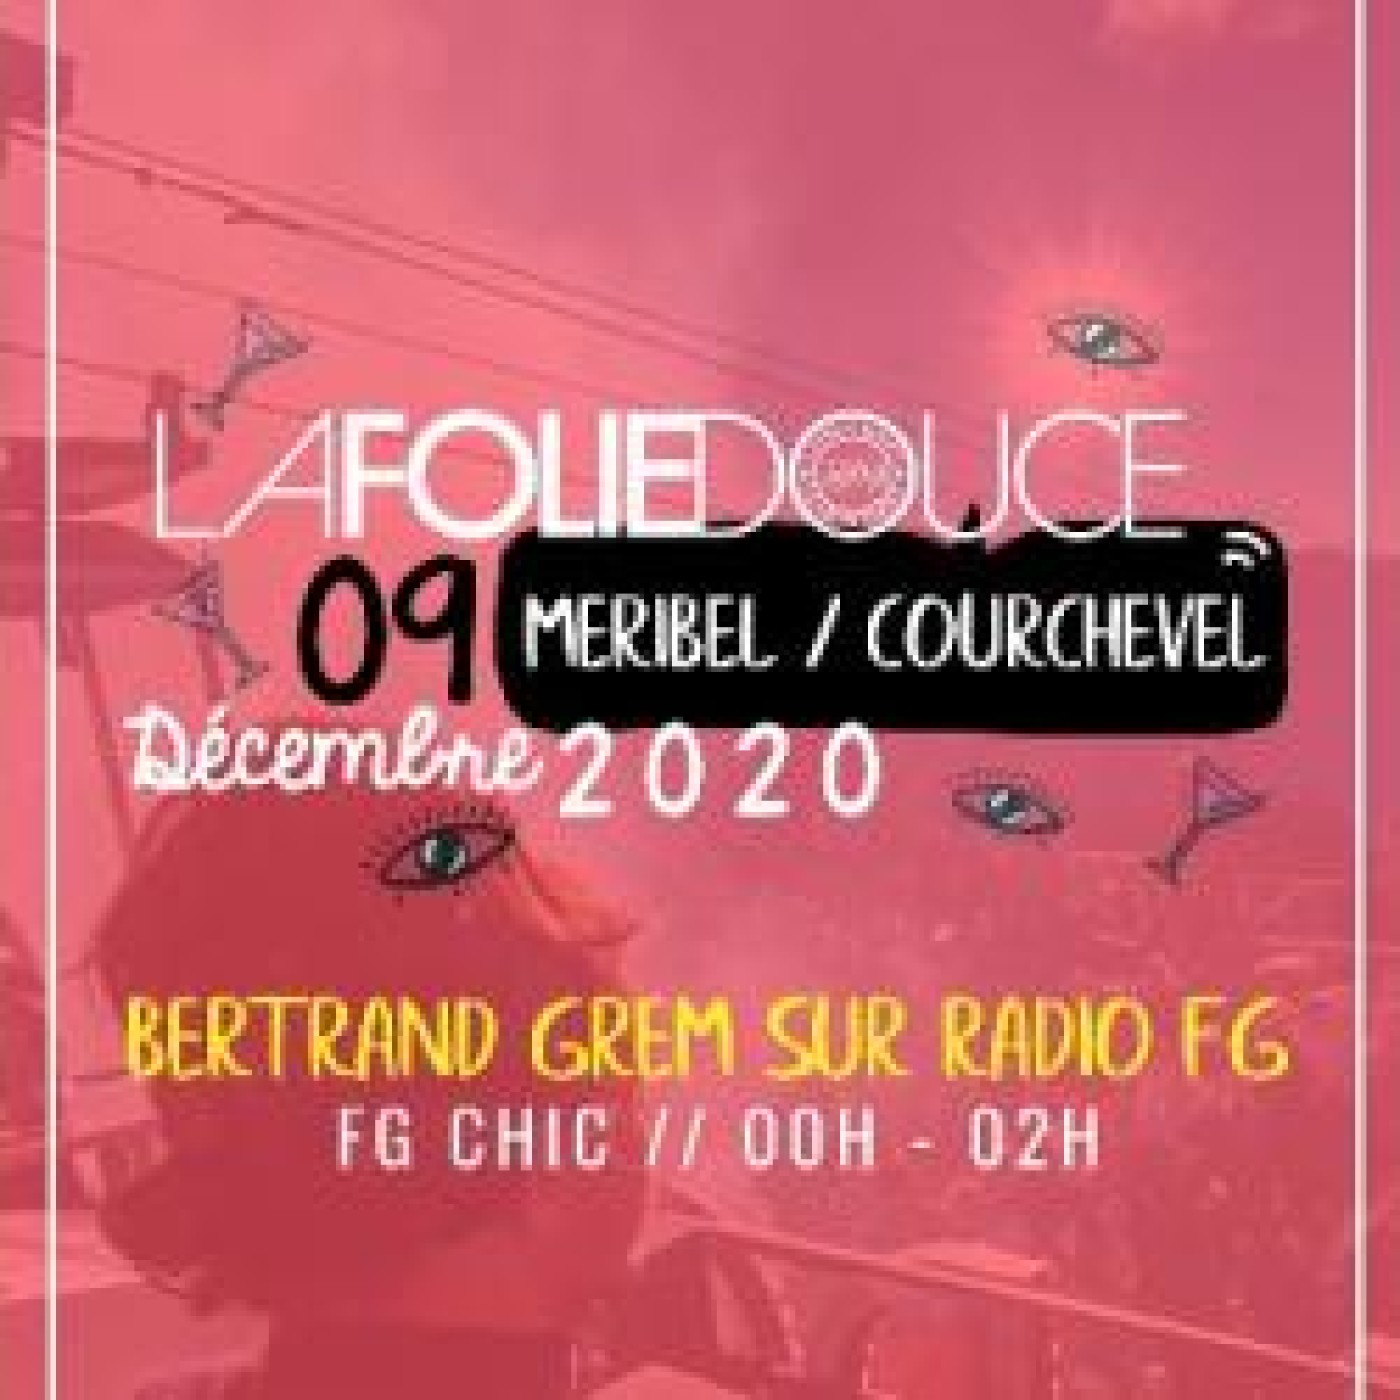 FG INVITE : LA FOLIE DOUCE